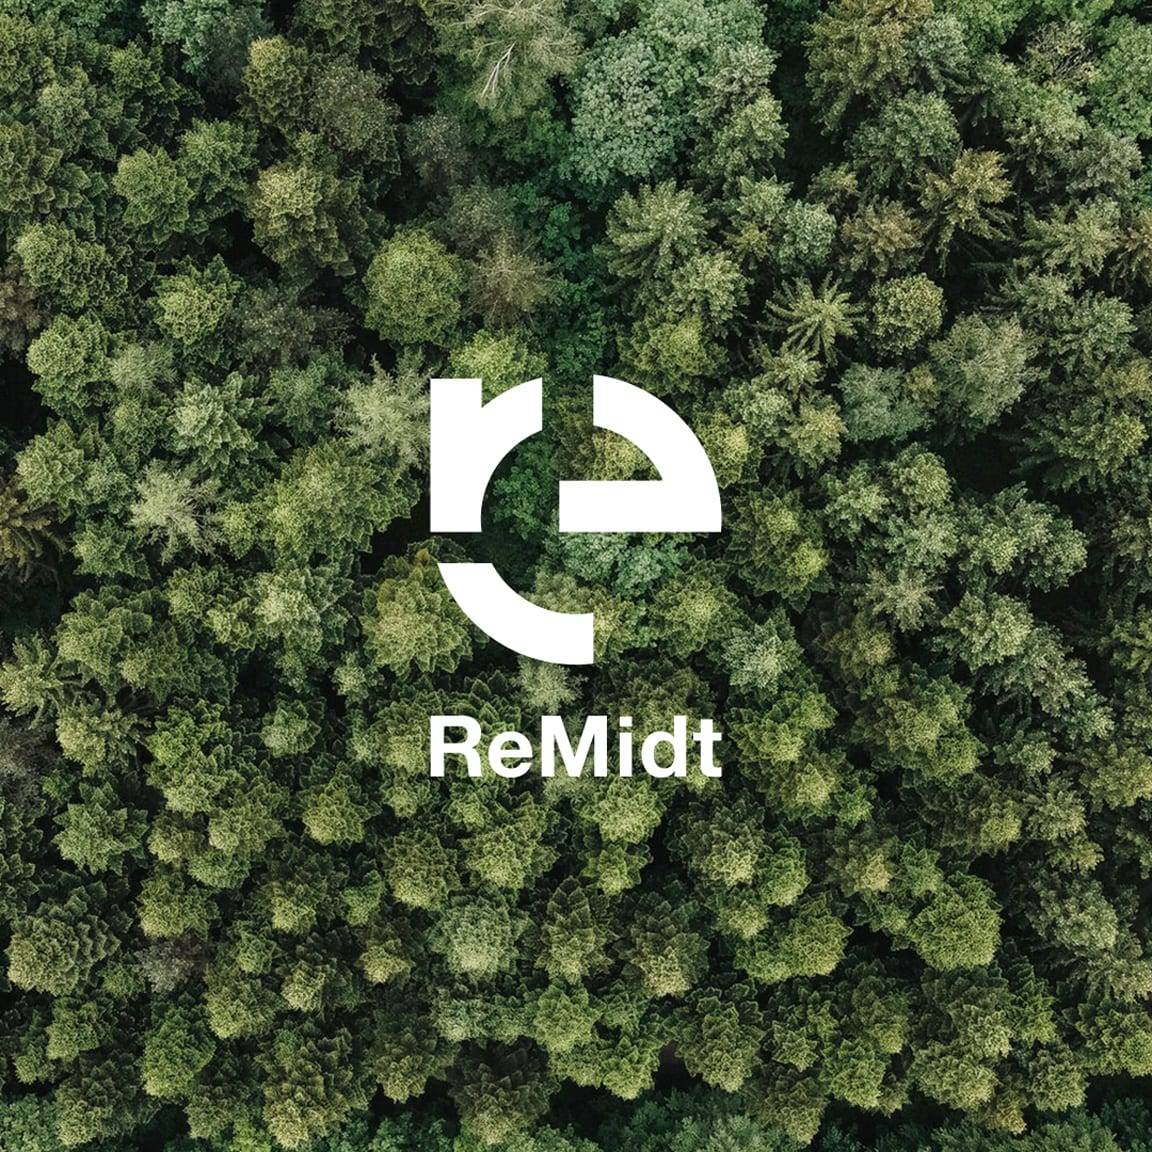 ReMidt